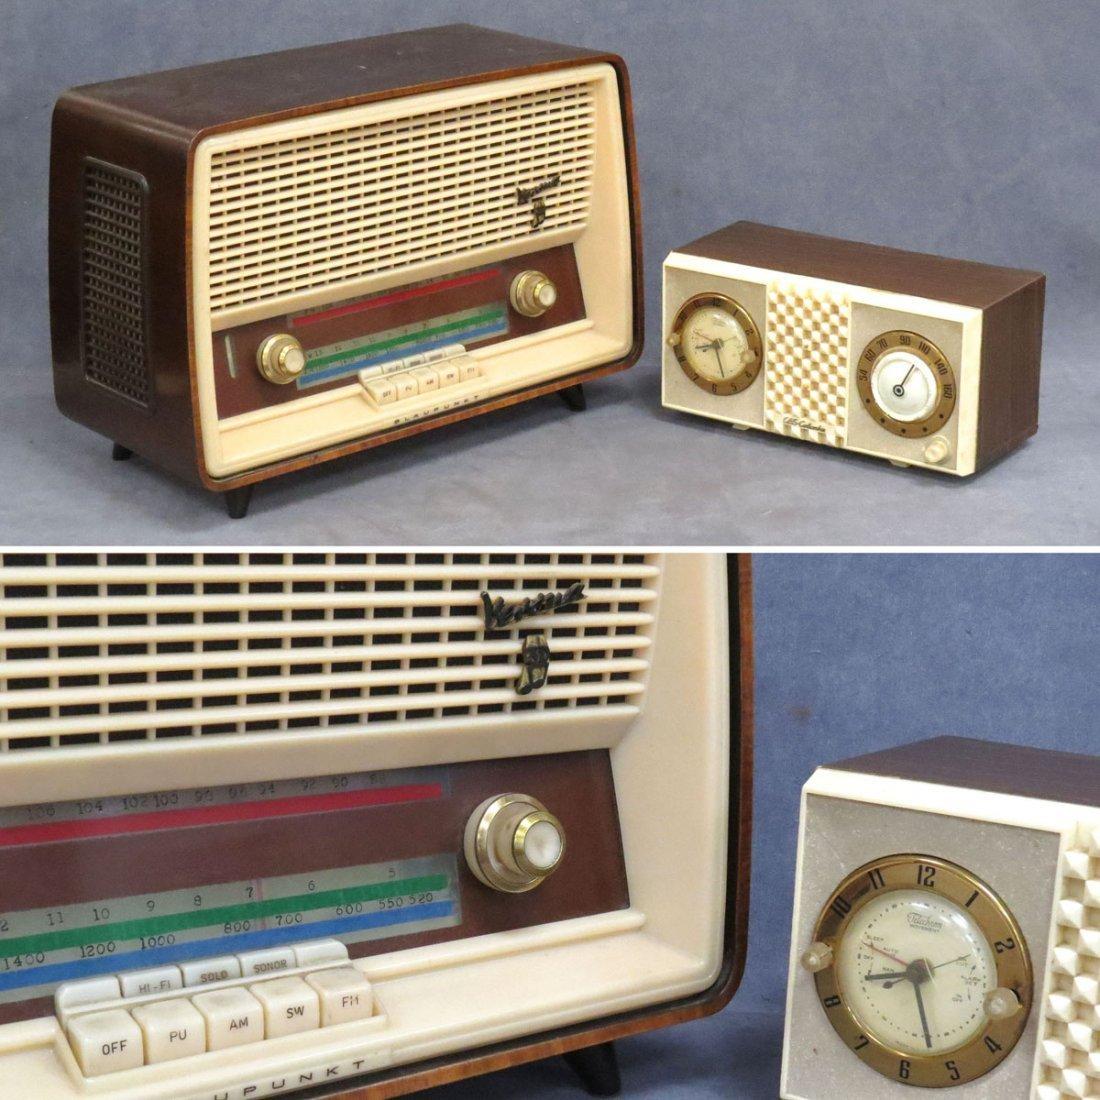 LOT (2) VINTAGE RADIOS INCLUDING BLAUPUNKT VERONA